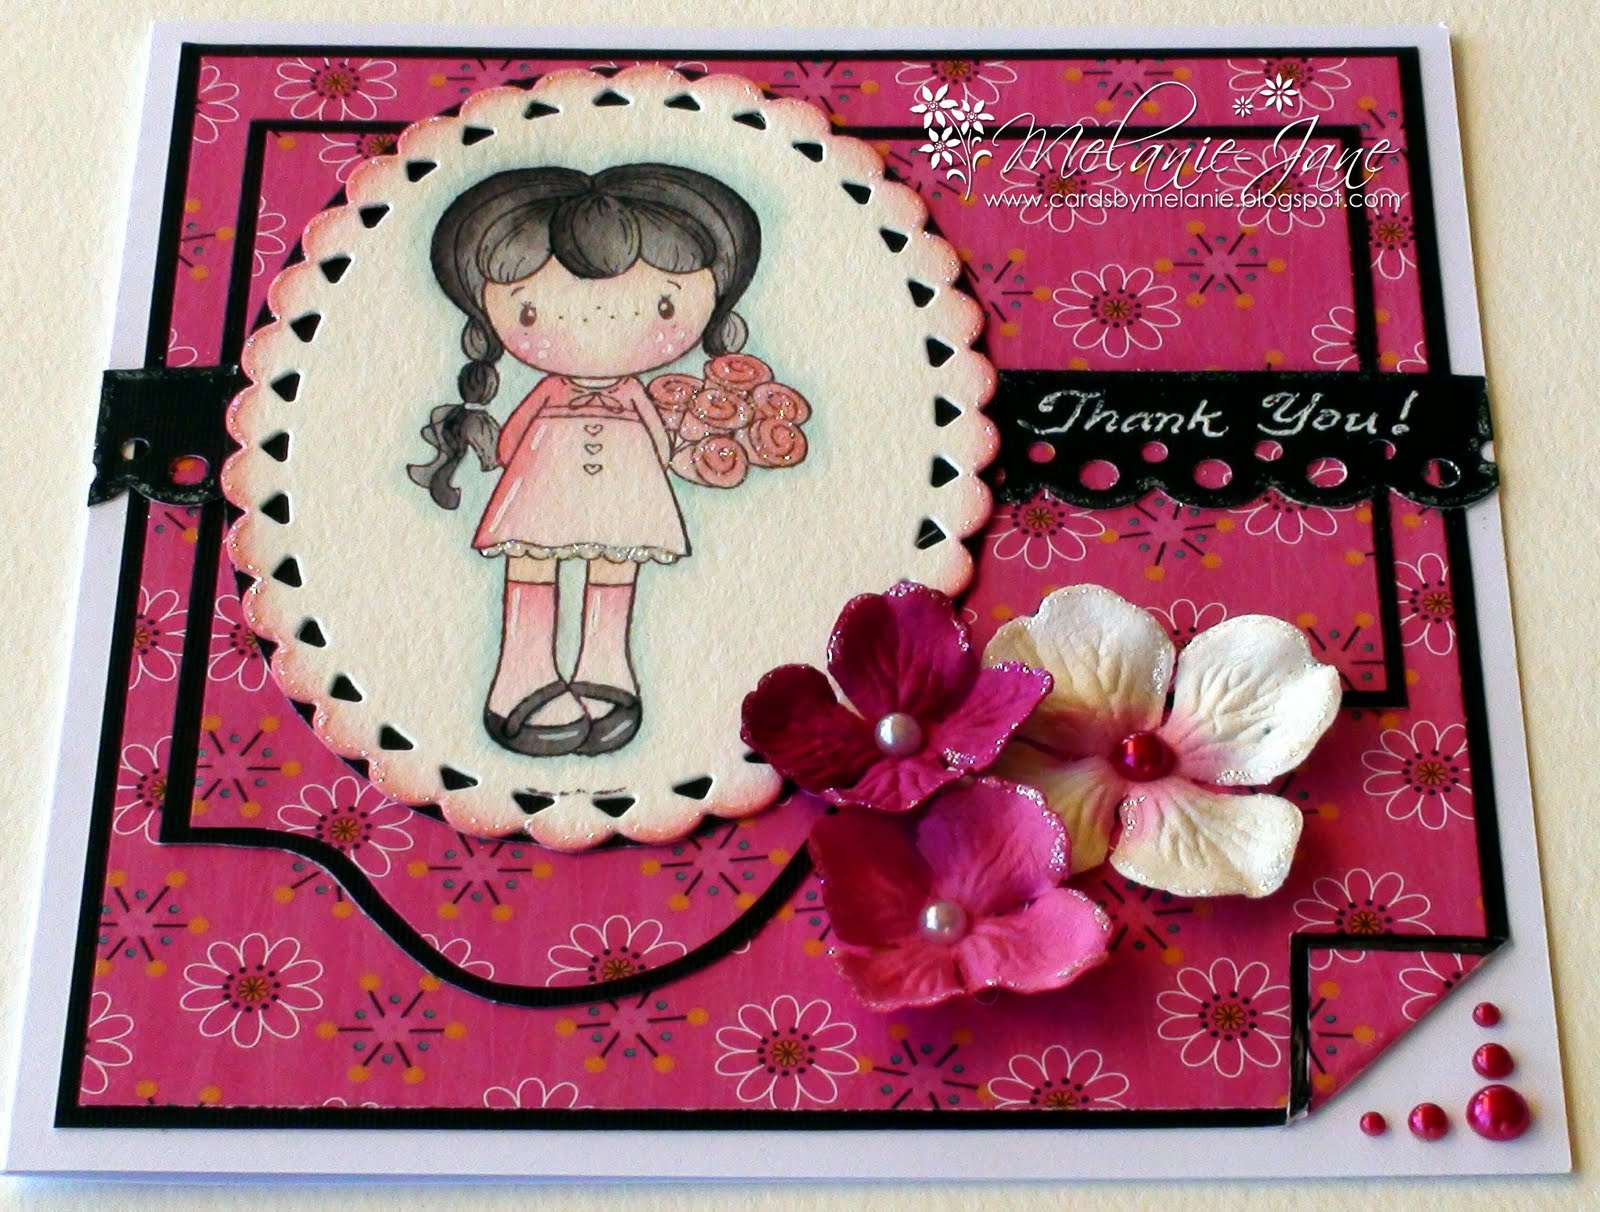 http://1.bp.blogspot.com/_jJ2UHkx_f3k/TGWFjEEFrZI/AAAAAAAAB1c/nasKsX8_org/s1600/rose+girl+2.JPG